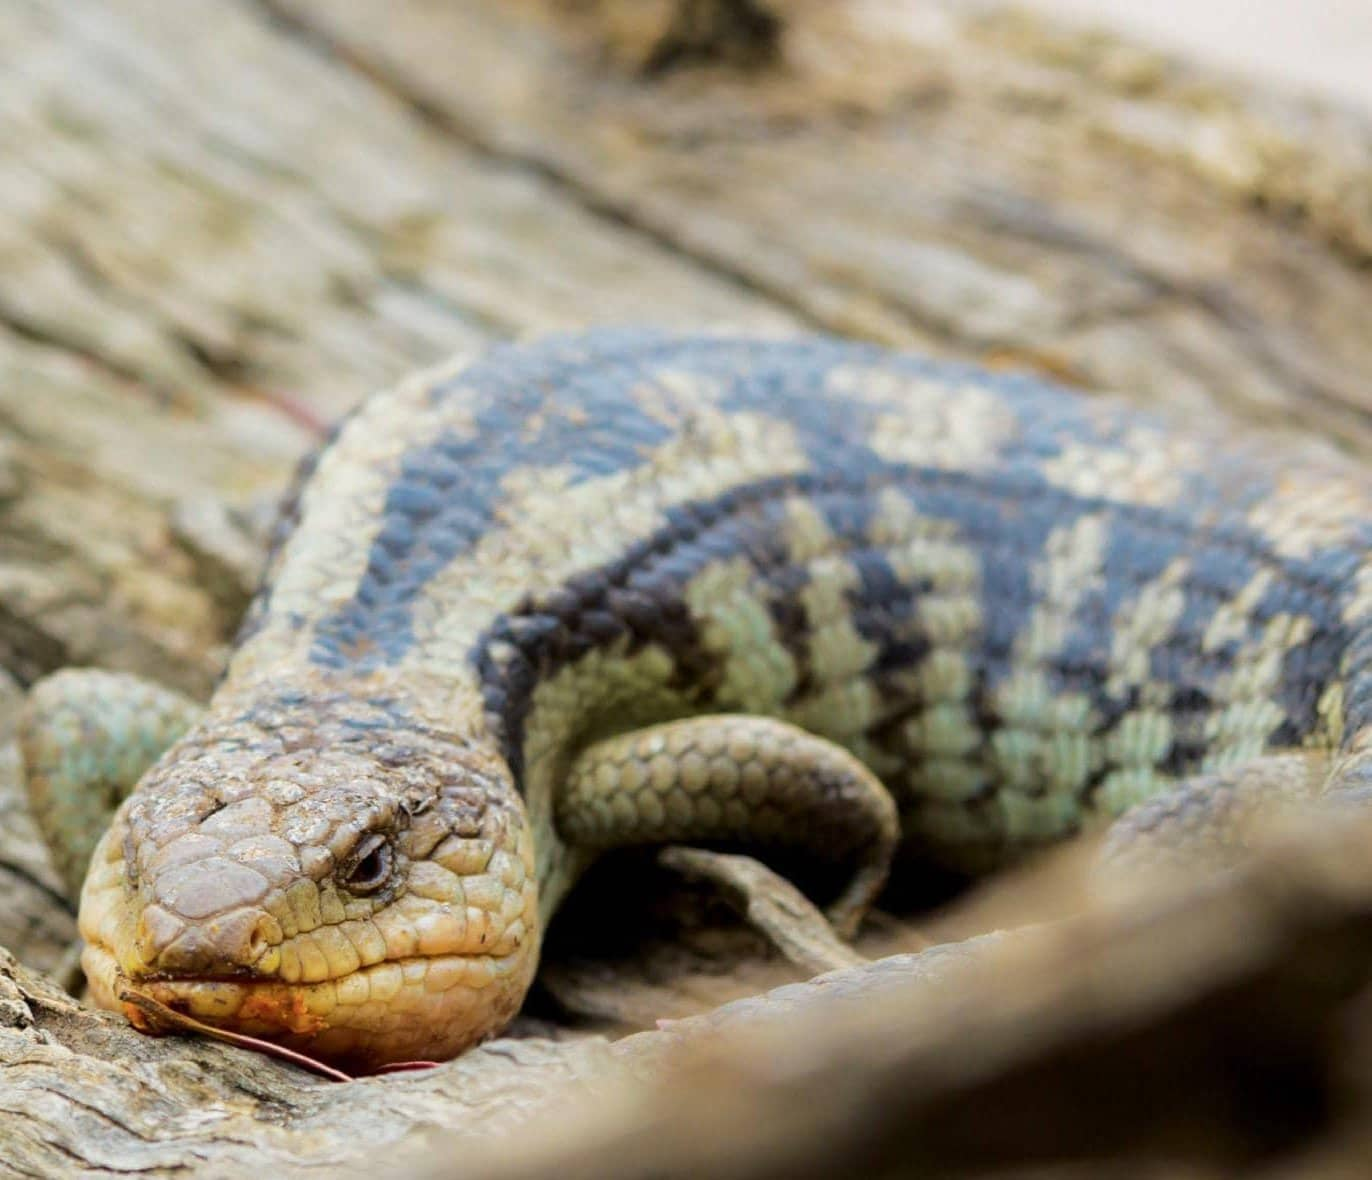 Backyard Reptile Park